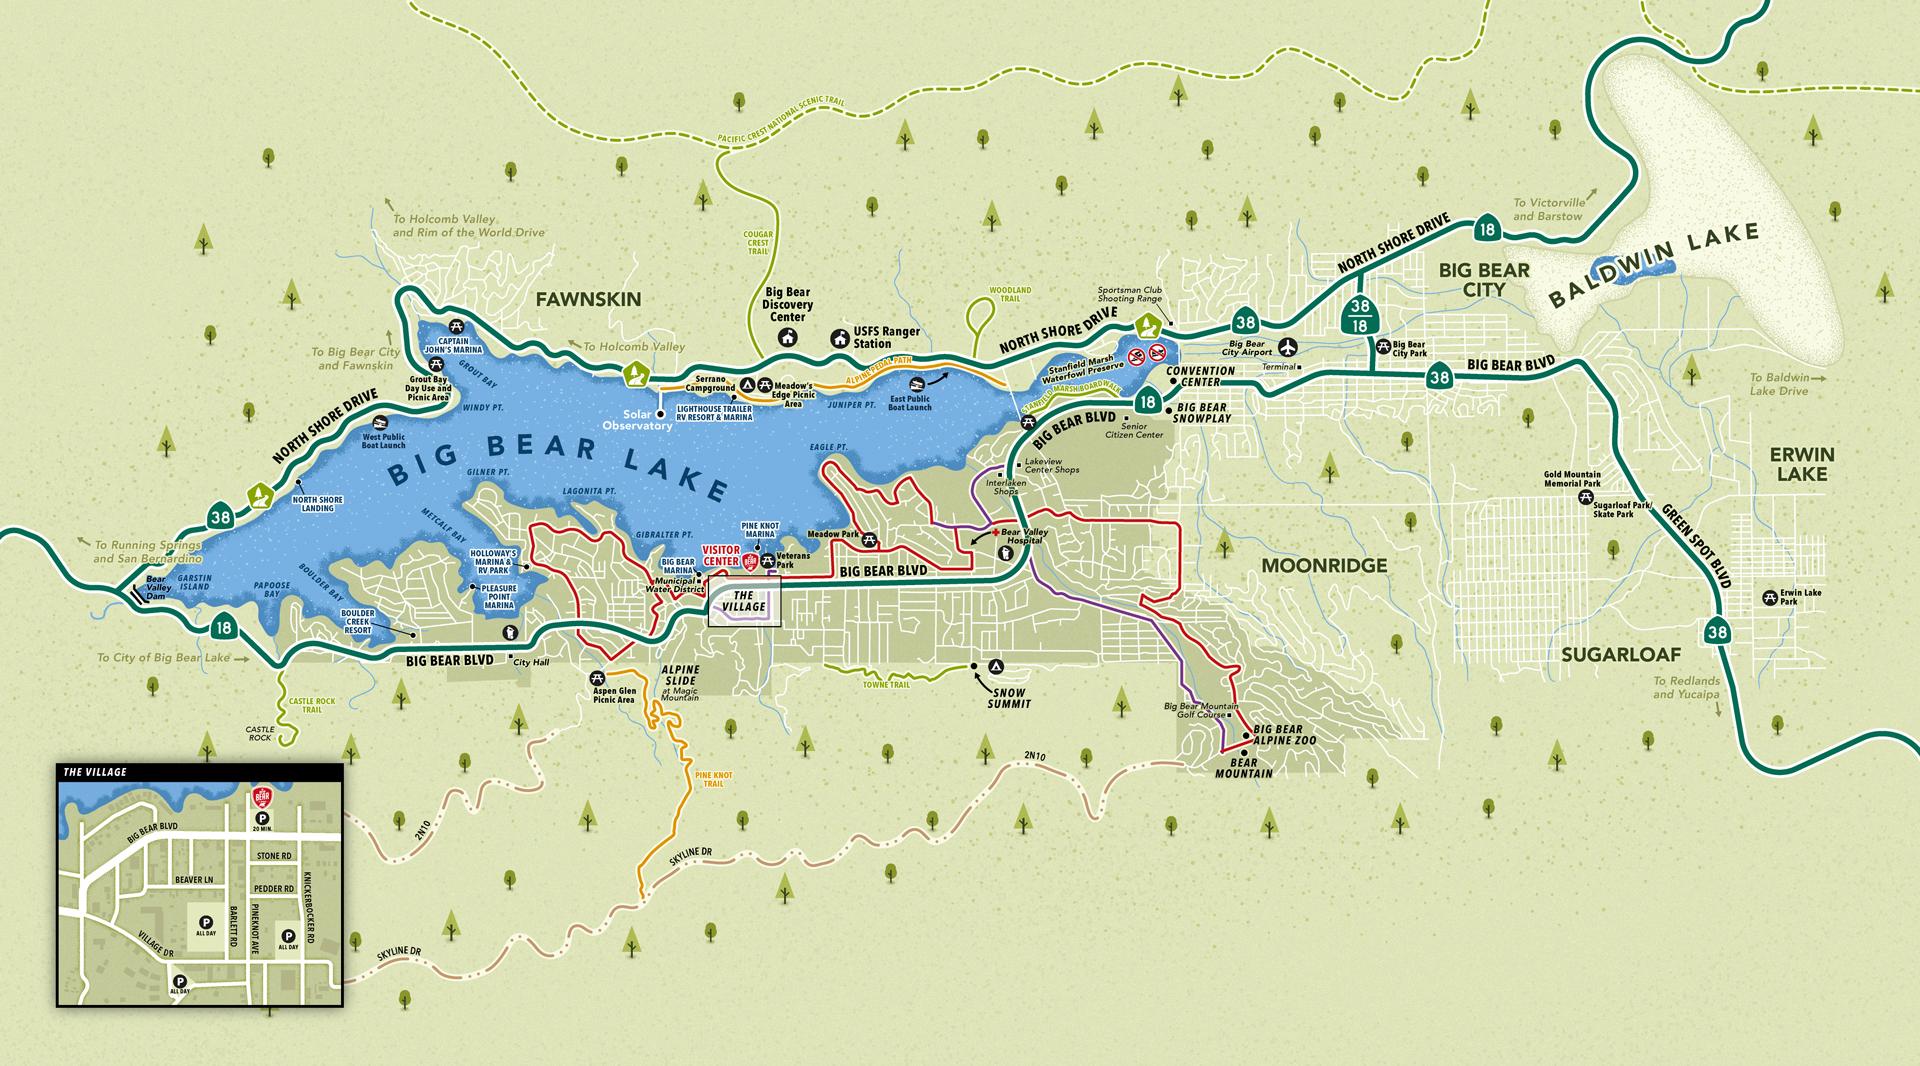 Big Bear Lake area map